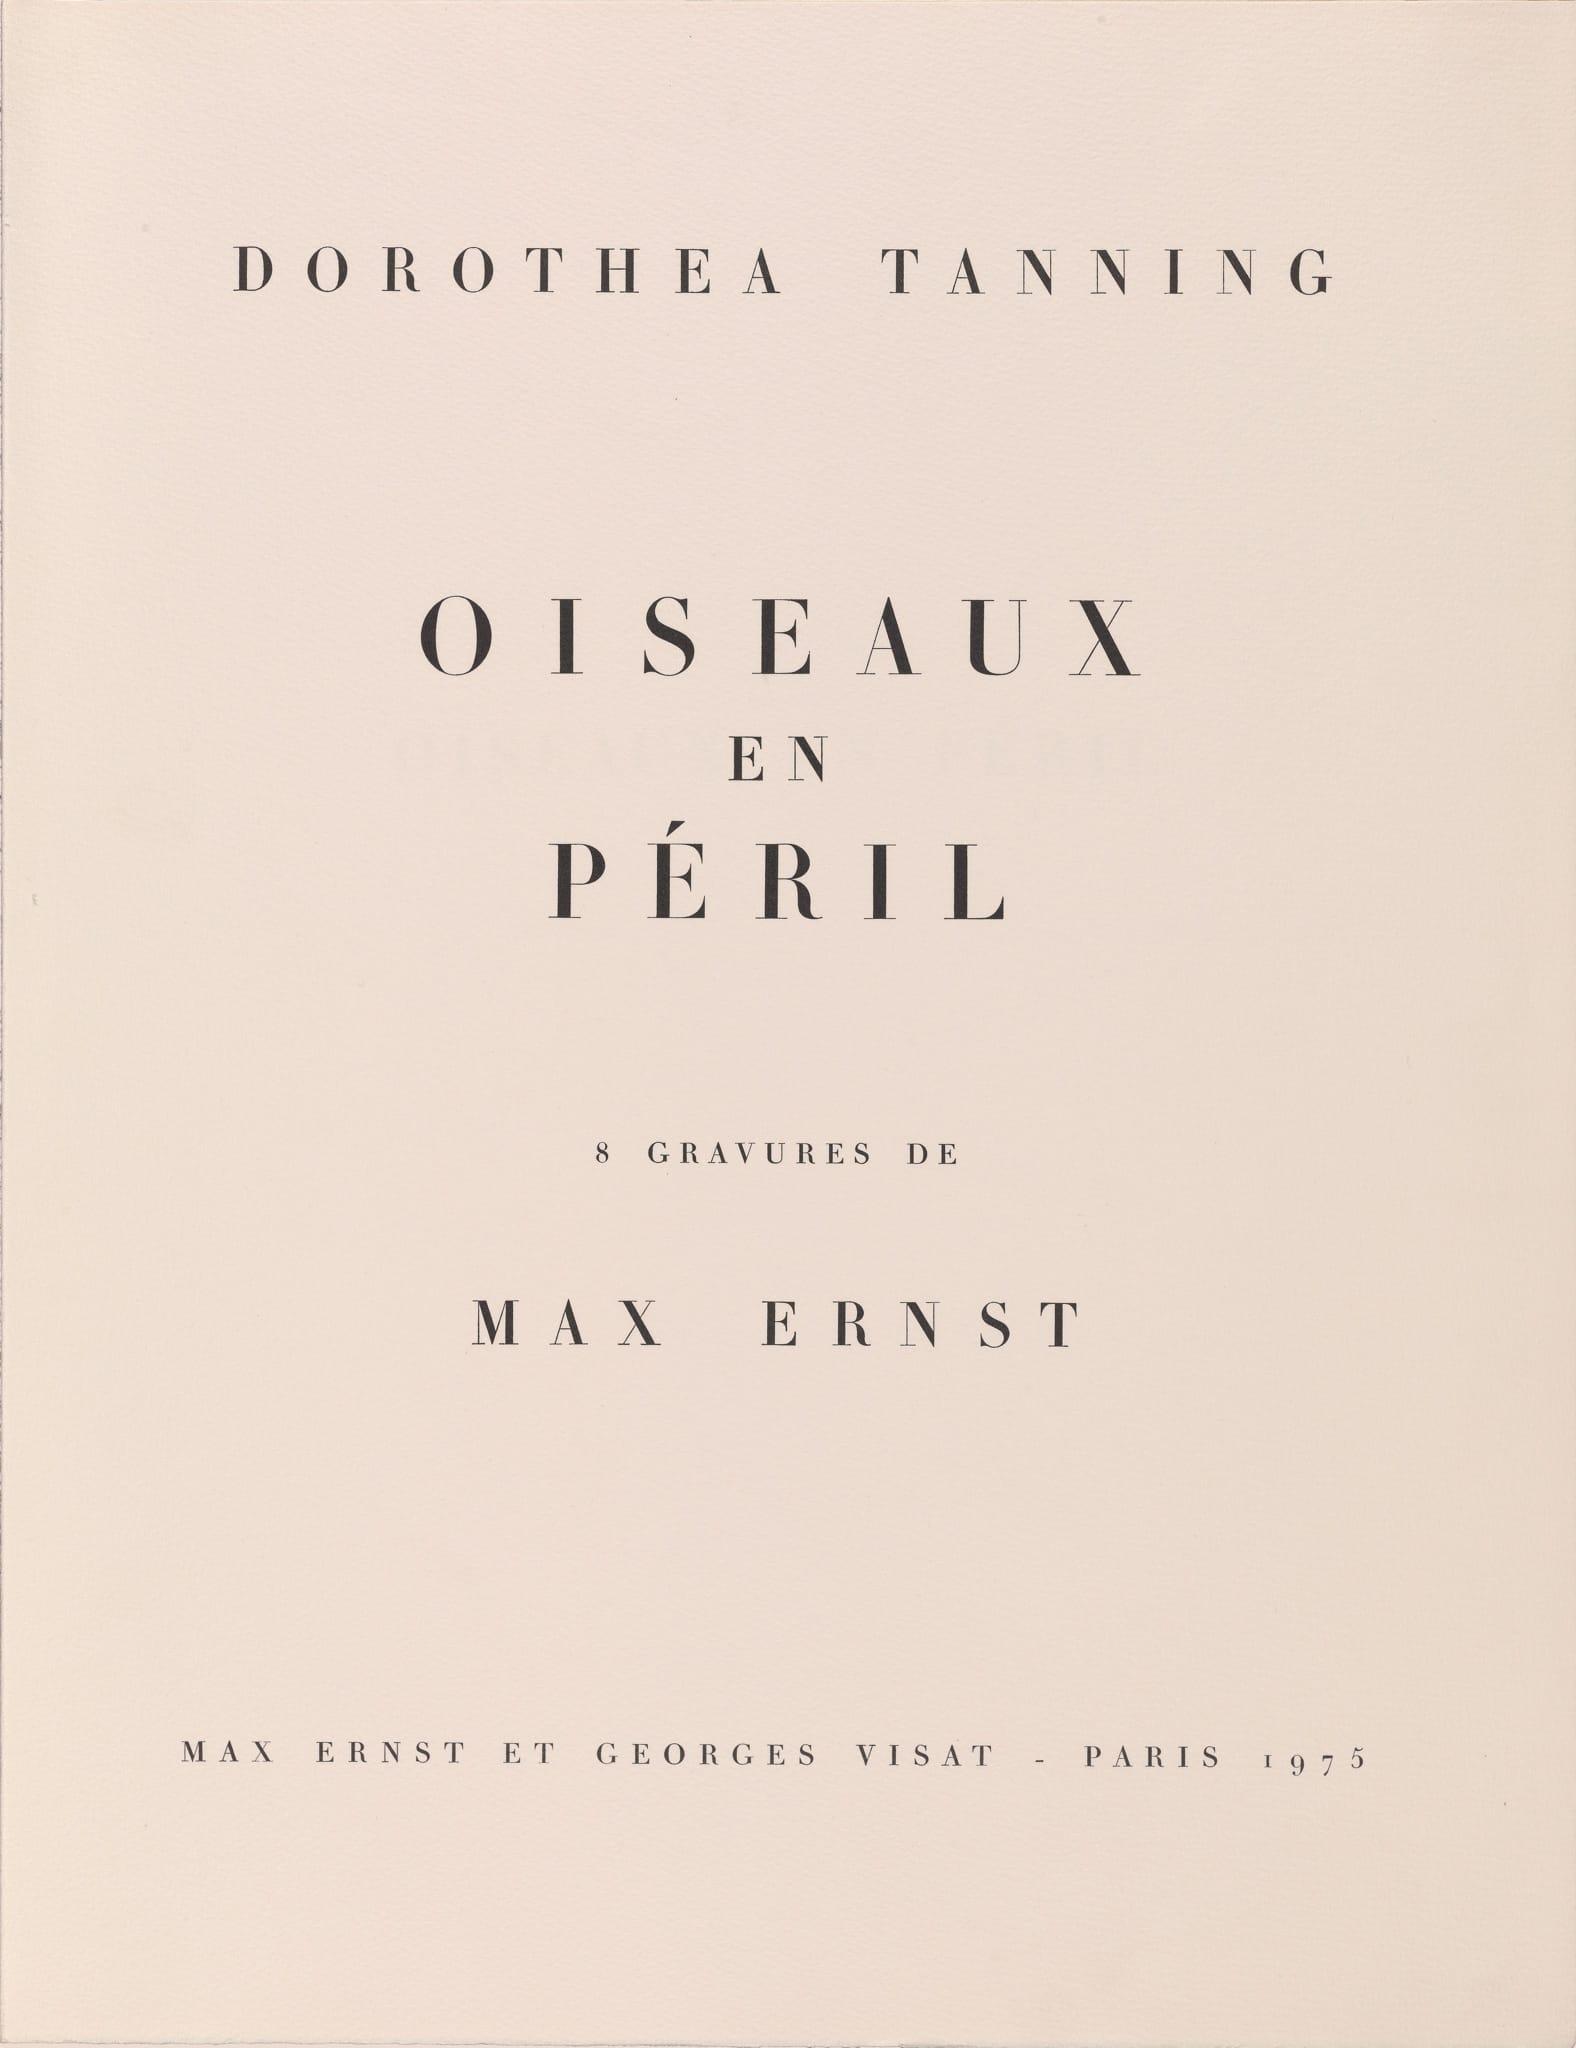 Dorothea Tanning, <br /><em>Oiseauxenpéril</em>, 1975